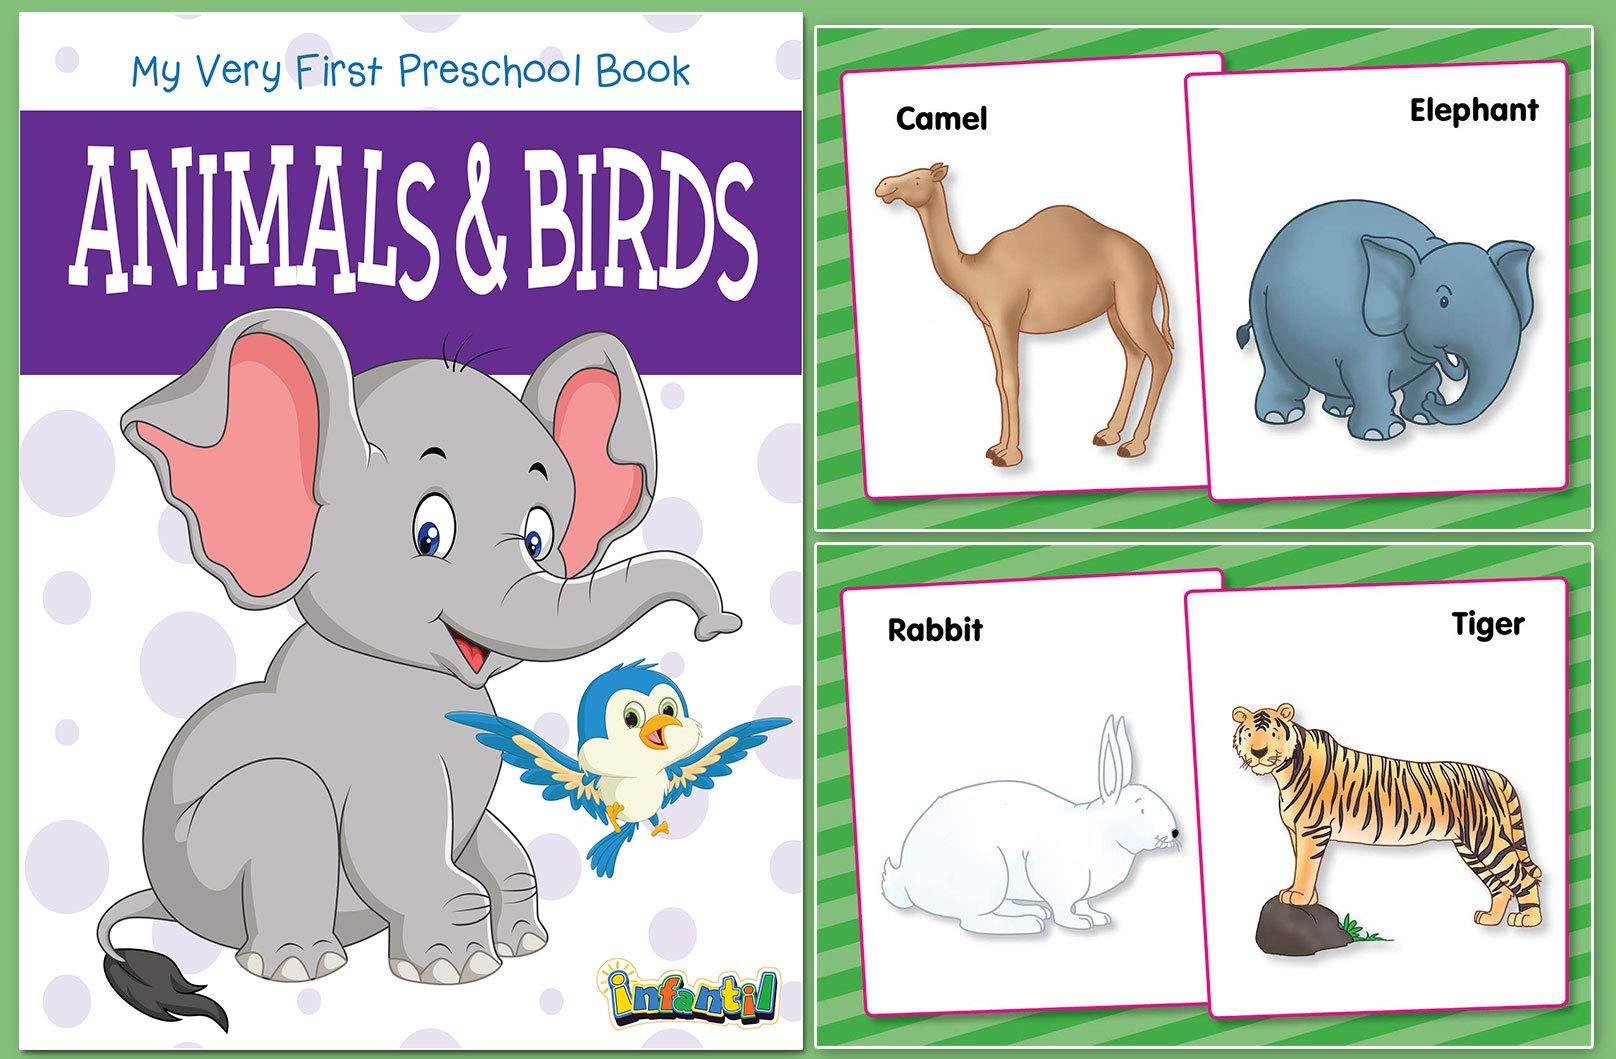 Animals & Birds (My Very First Preschool Book)